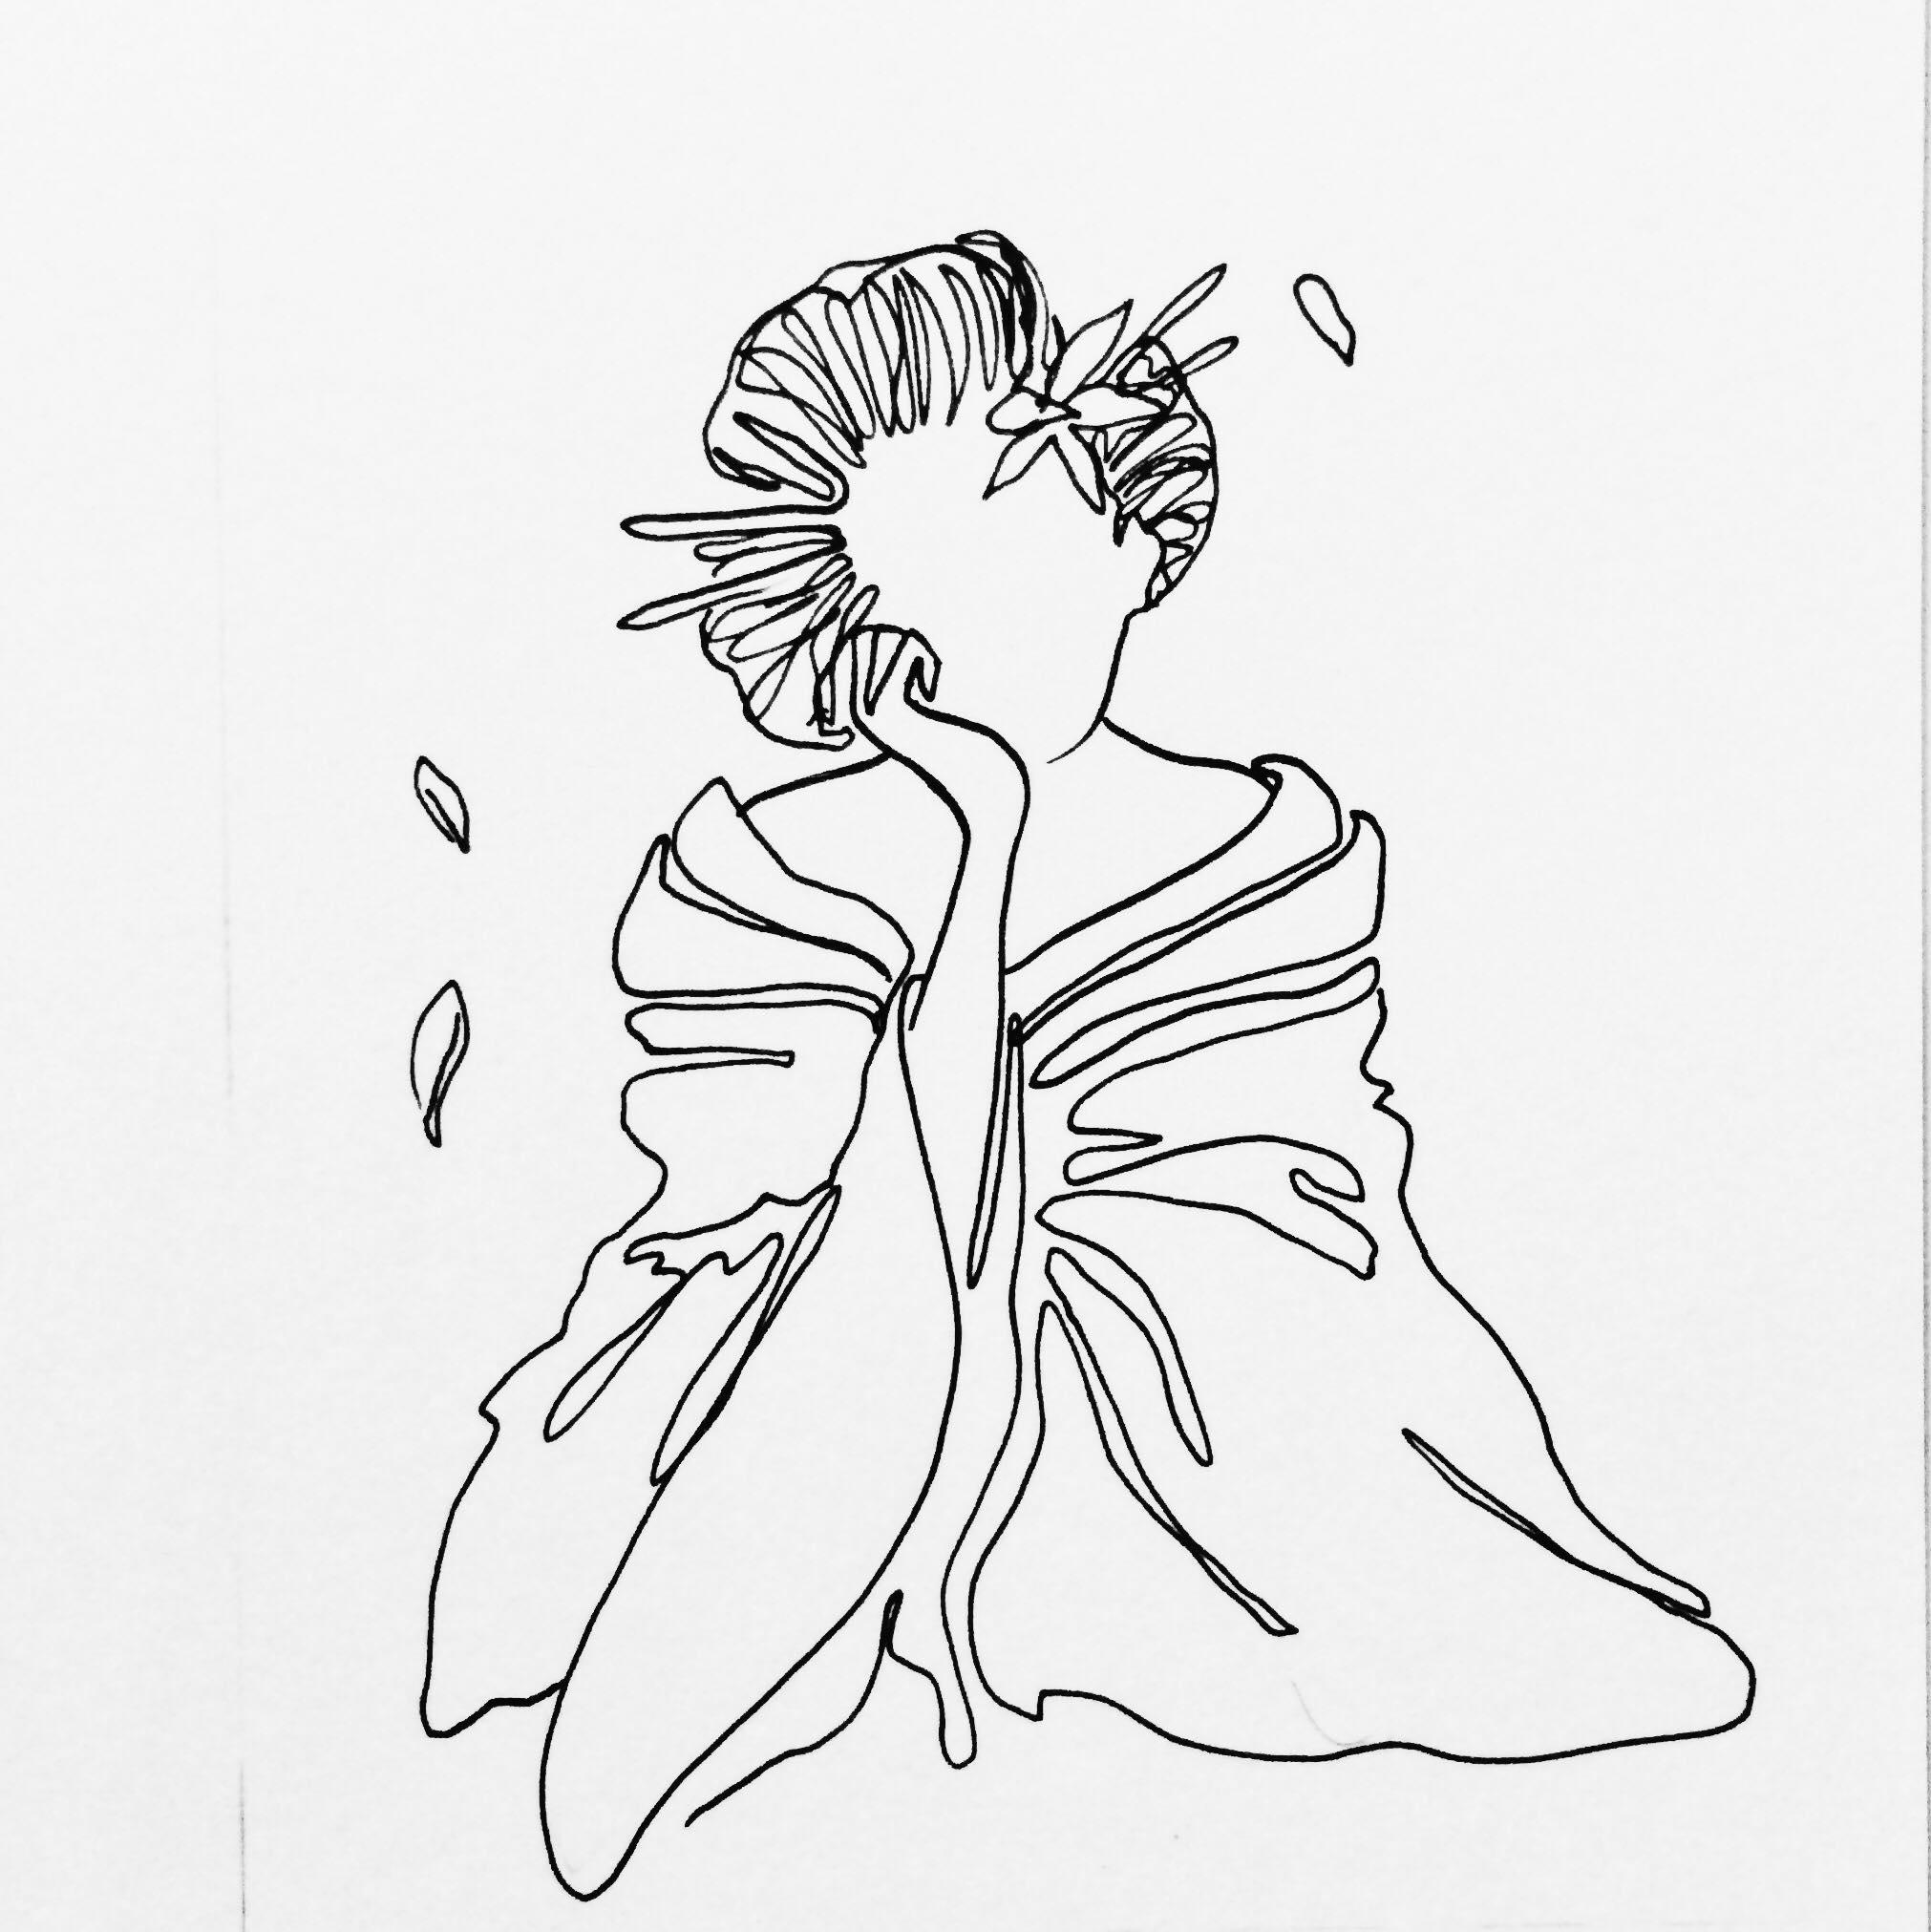 She creates and conserves - geisha green